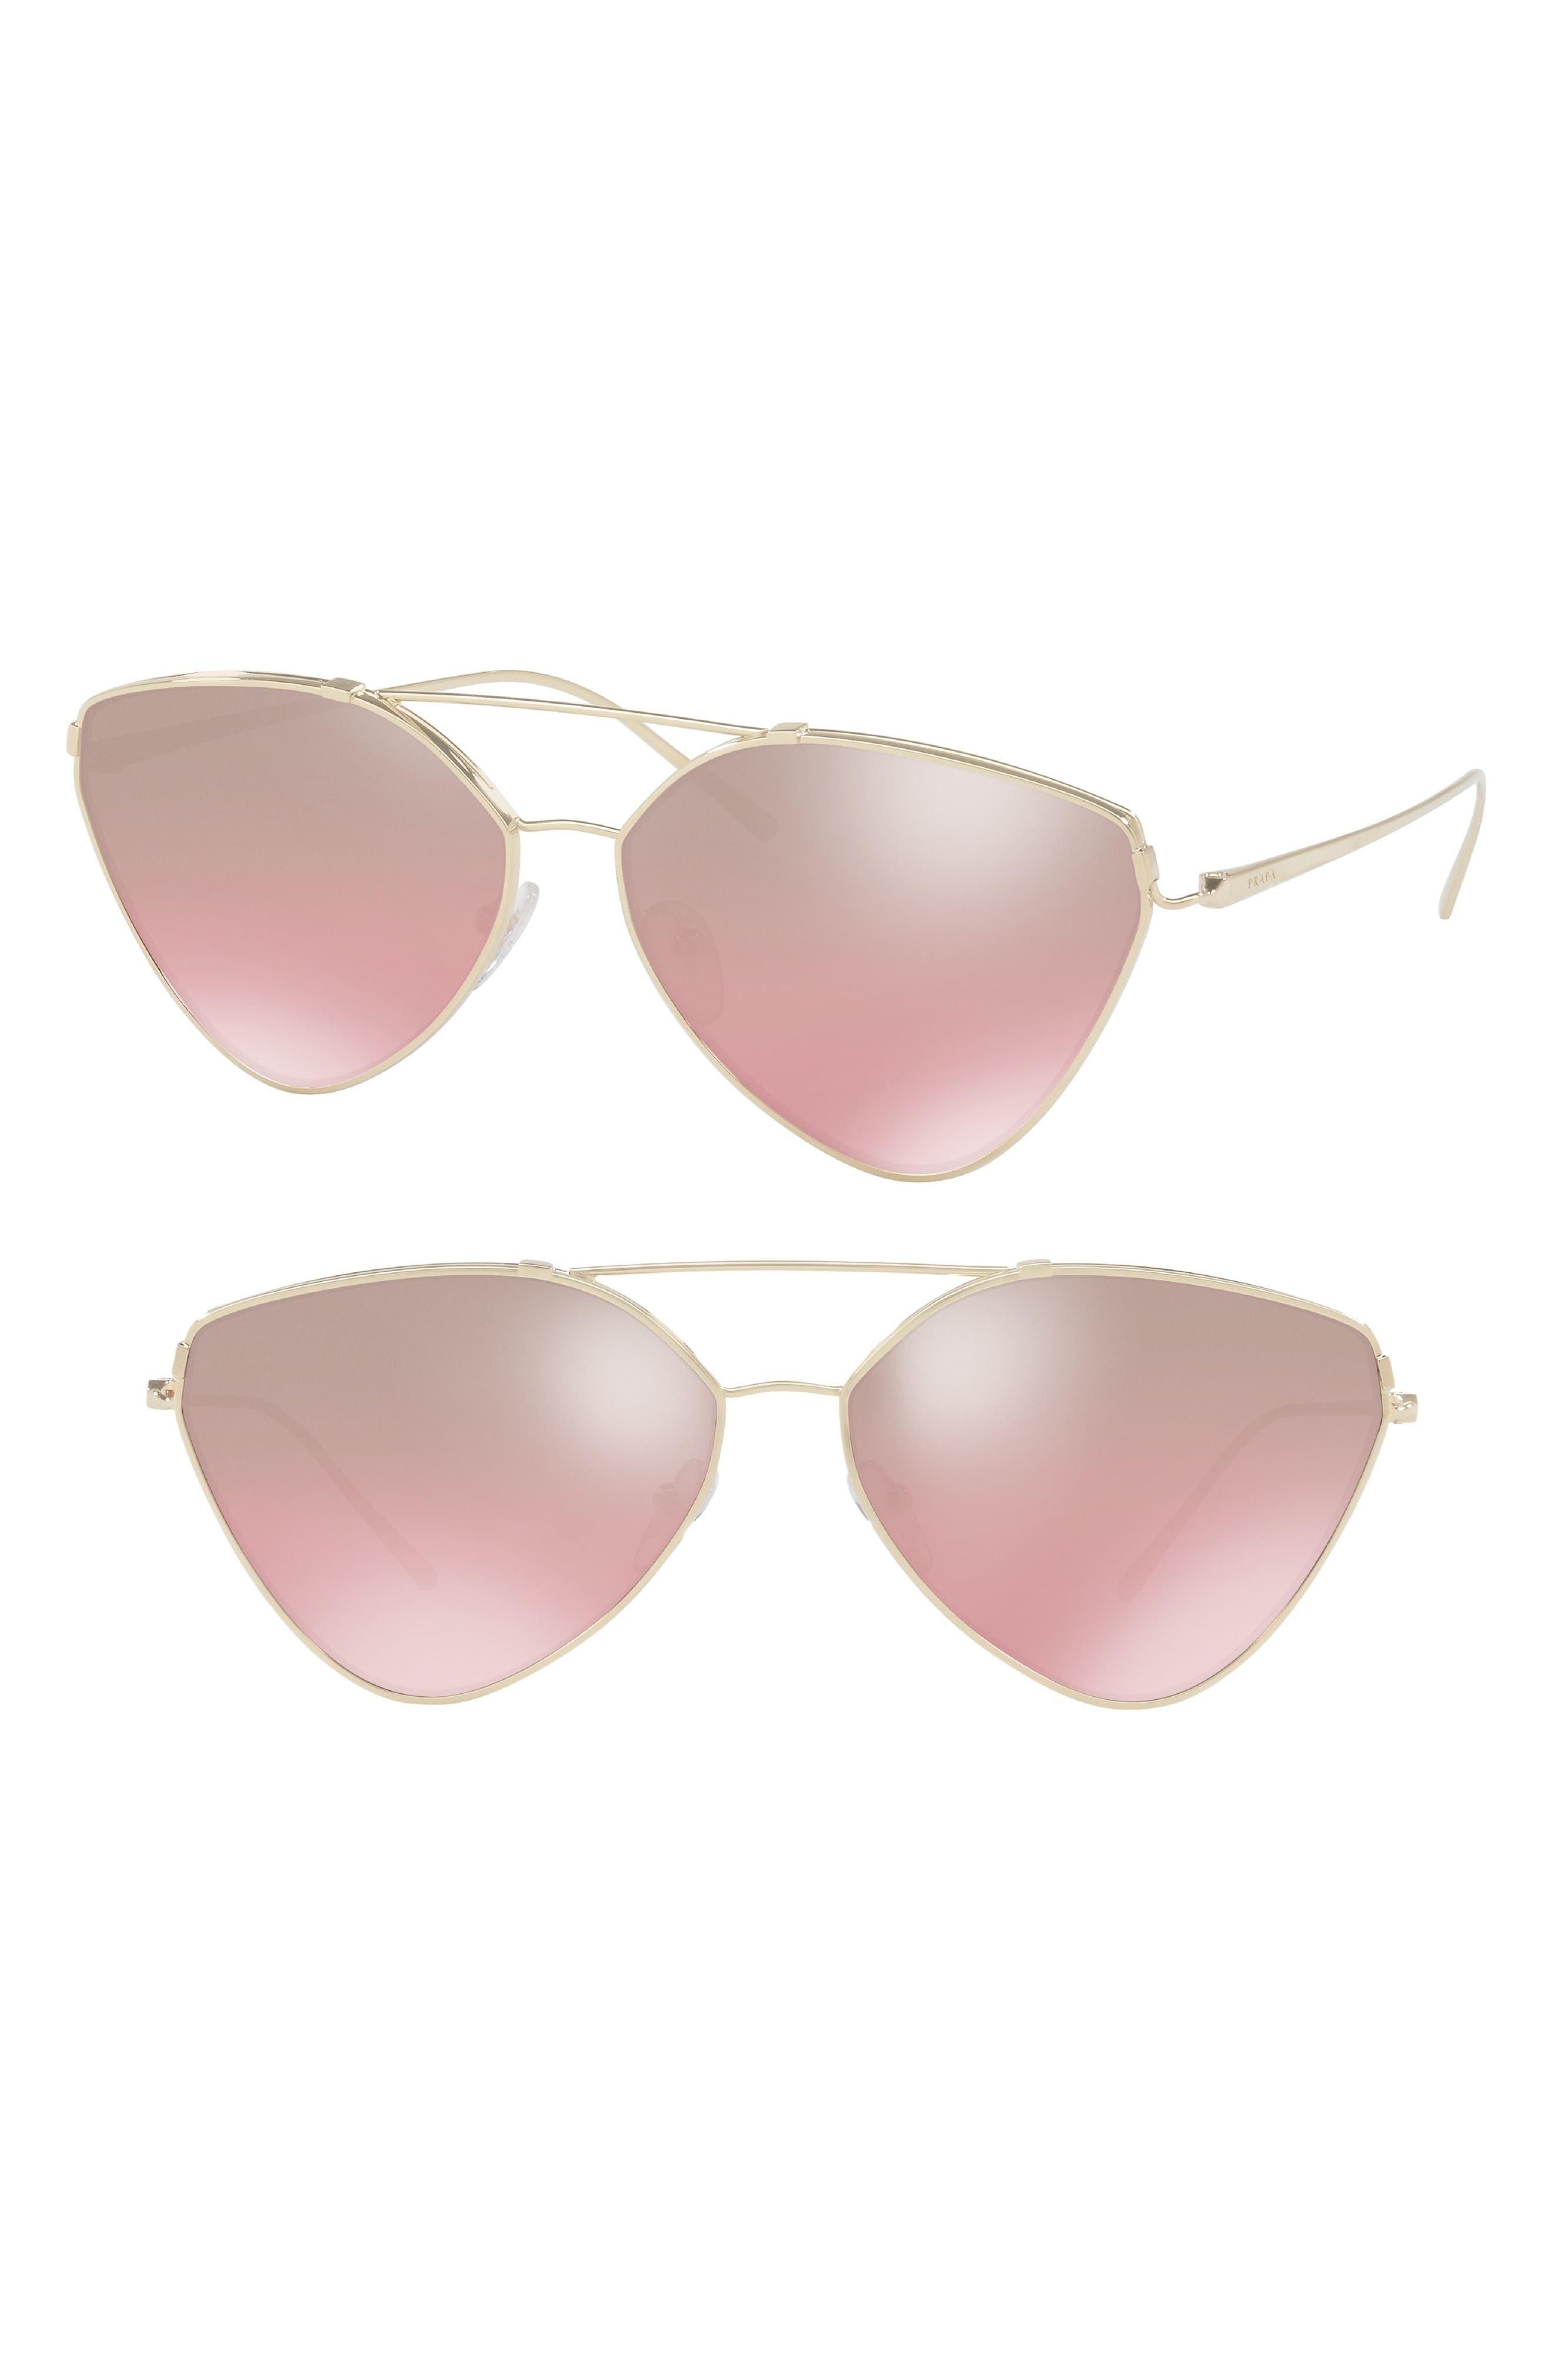 62mm Gradient Aviator Sunglasses,                             Main thumbnail 1, color,                             650